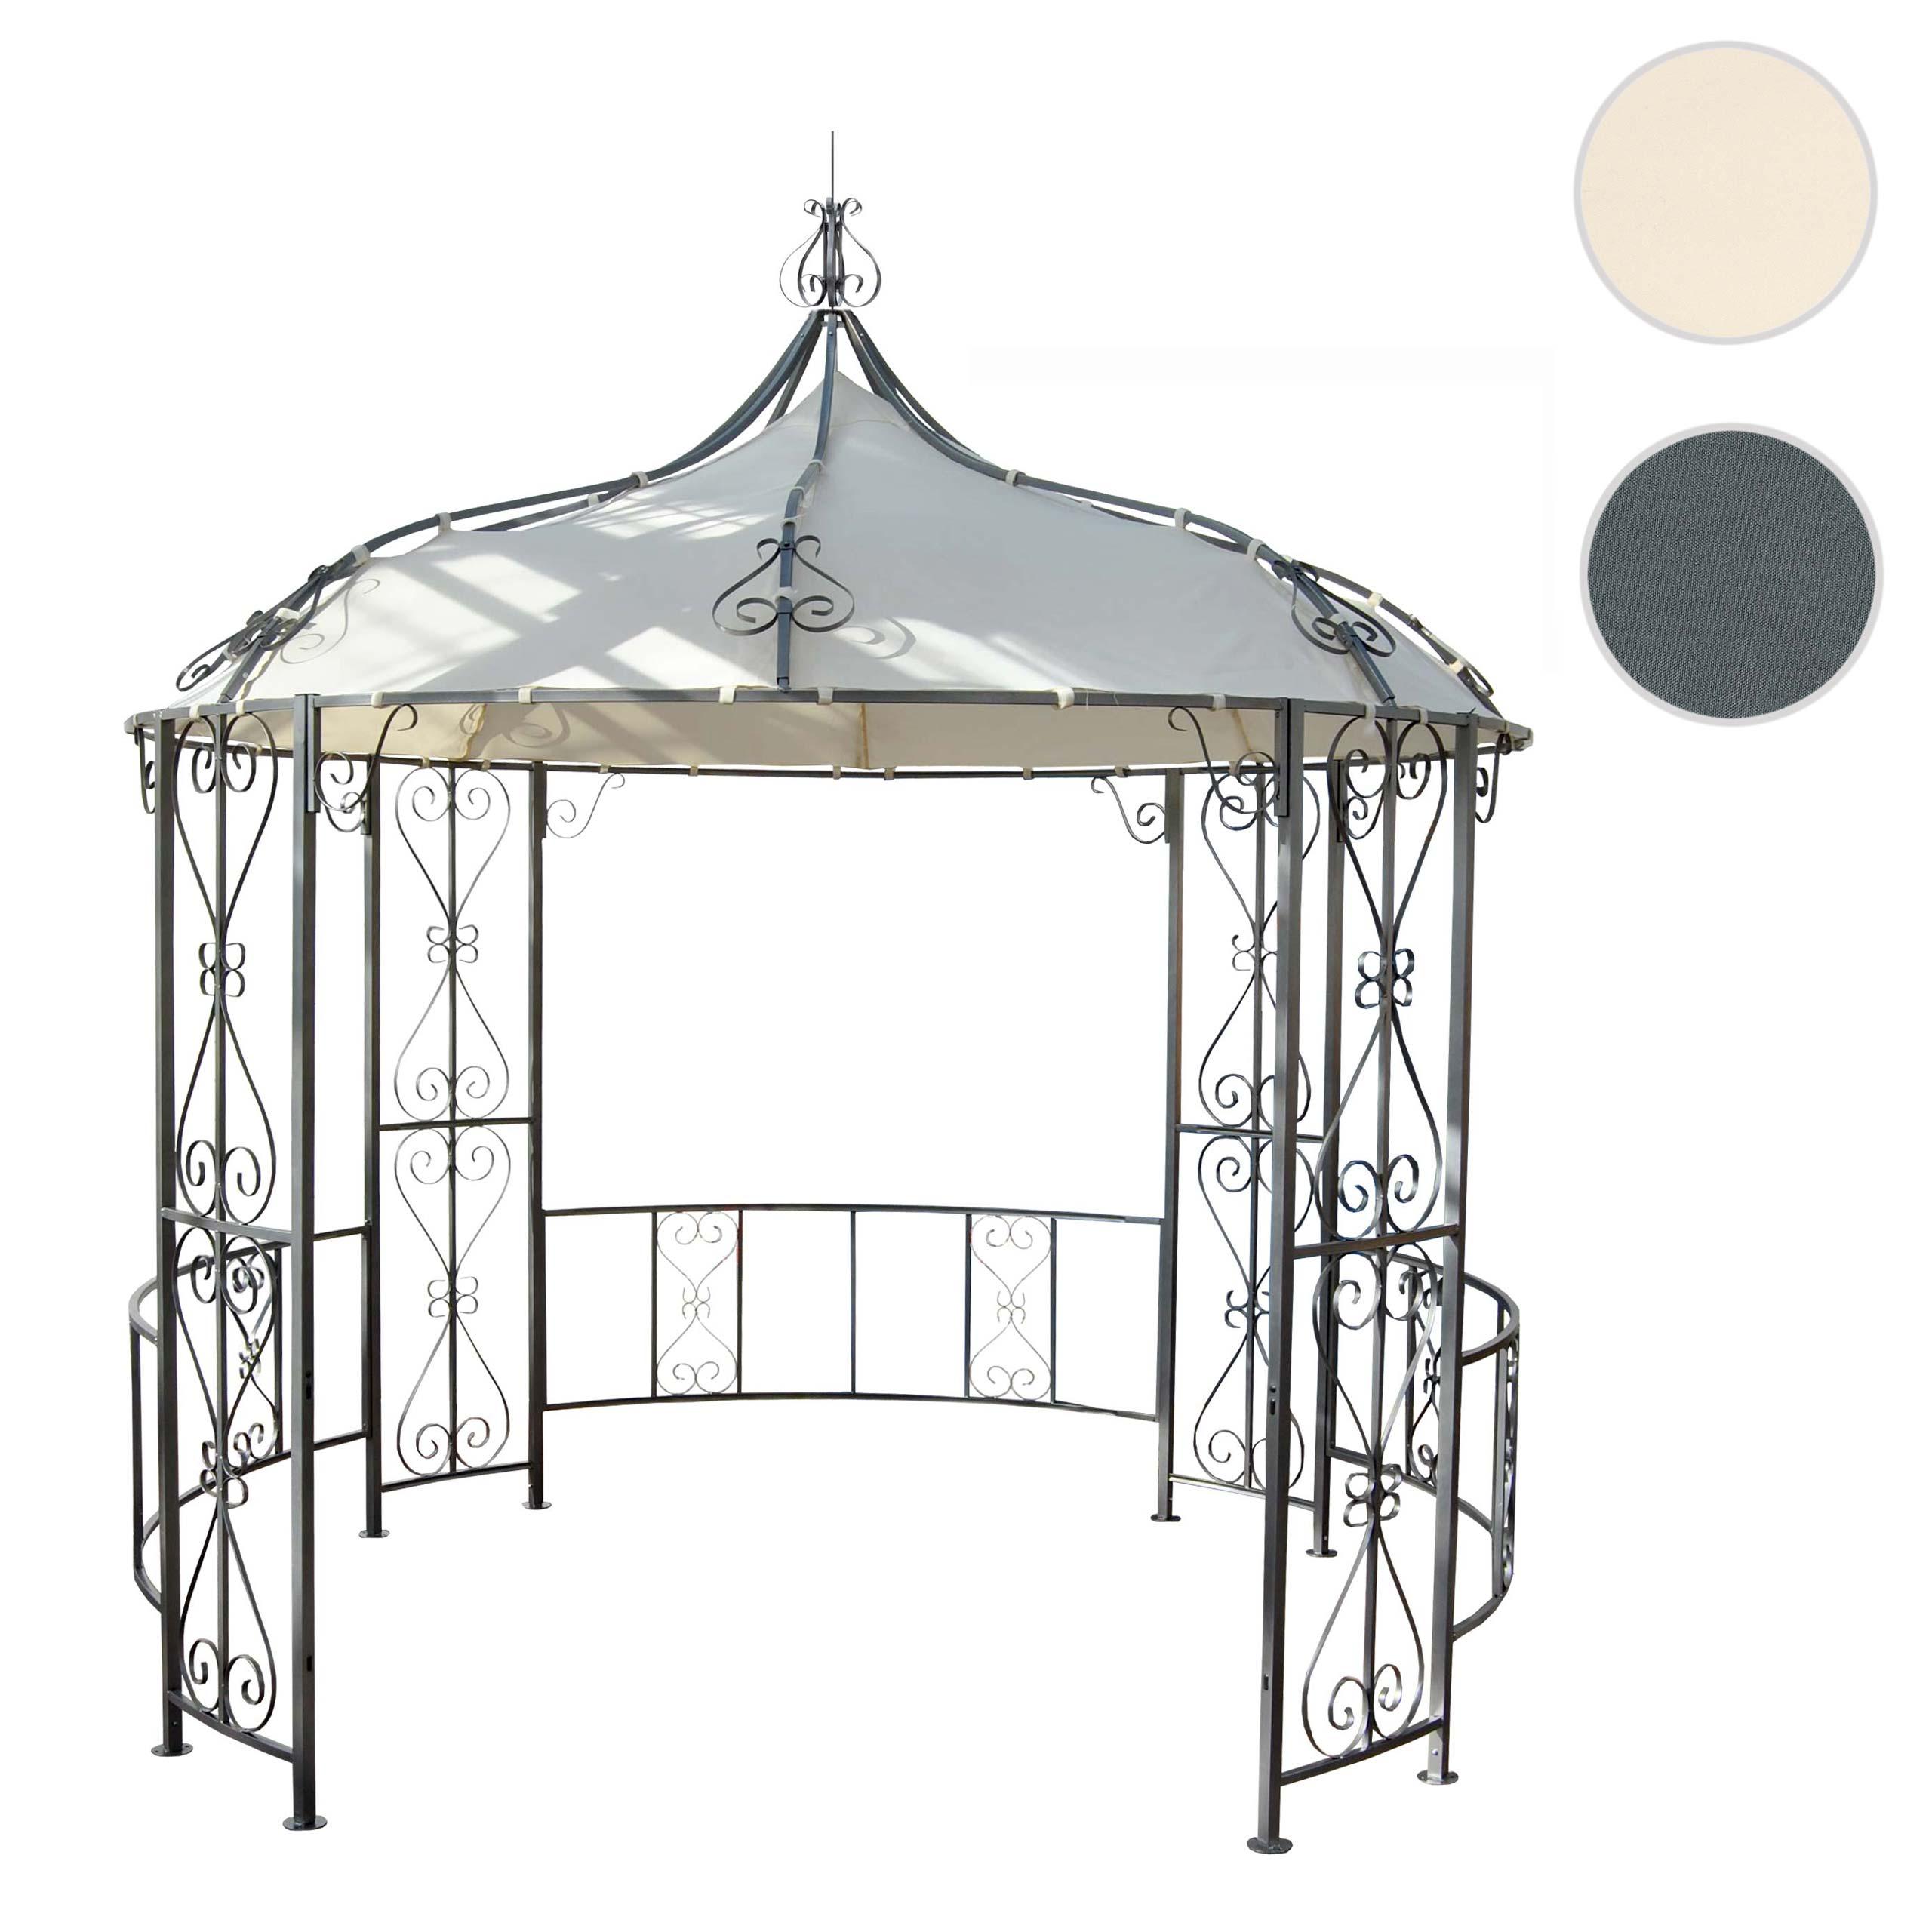 Mendler Pergola Almeria, Rundpavillon Garten Pavillon, stabiles Stahl-Gestell ~ Variantenangebot 45138+45481